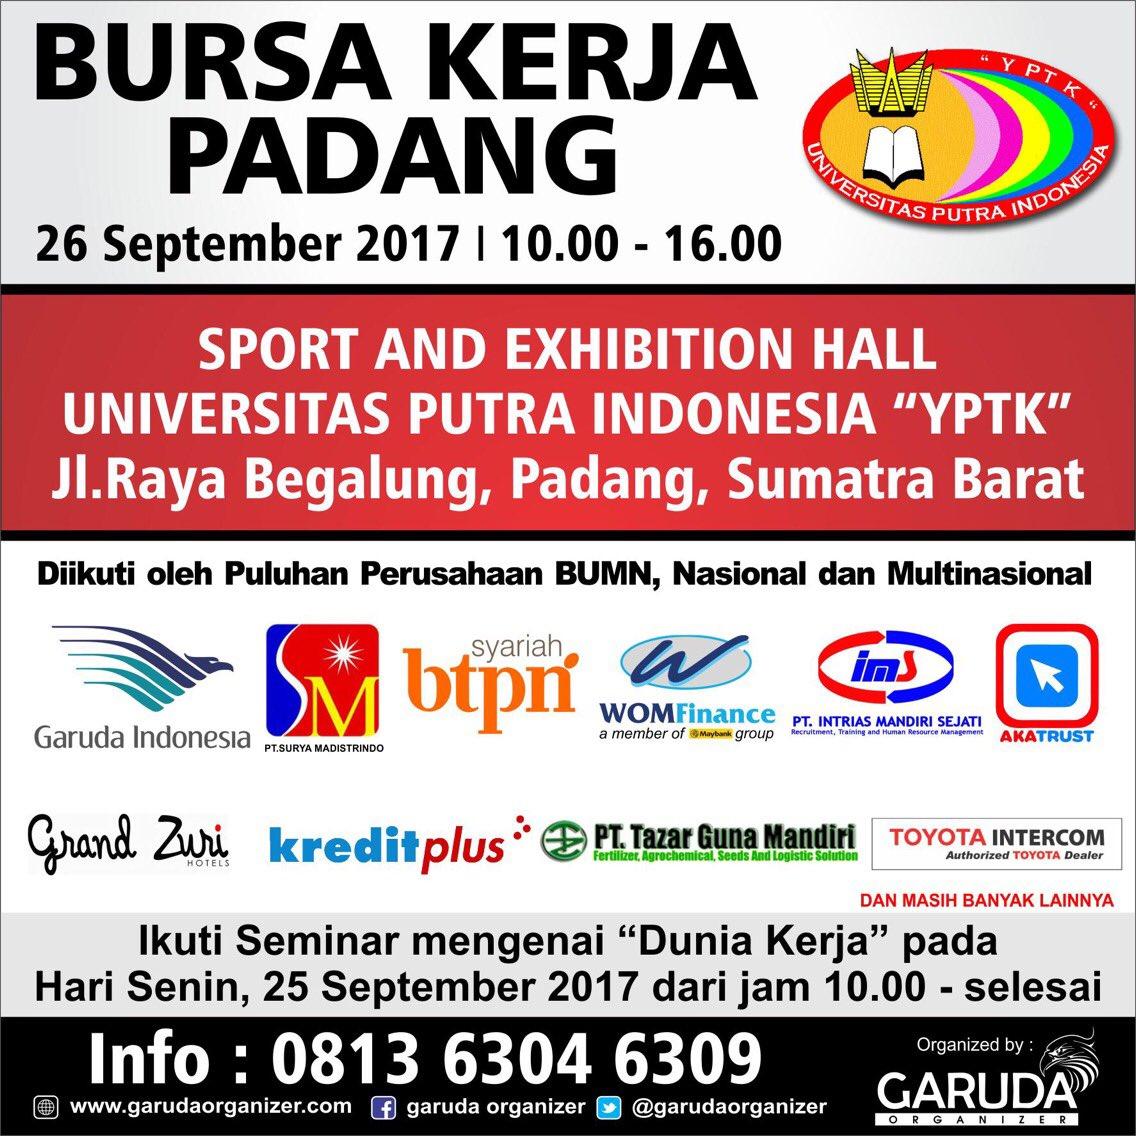 Padang Job Fair September 2017 - Exp HALL UPI YPTK